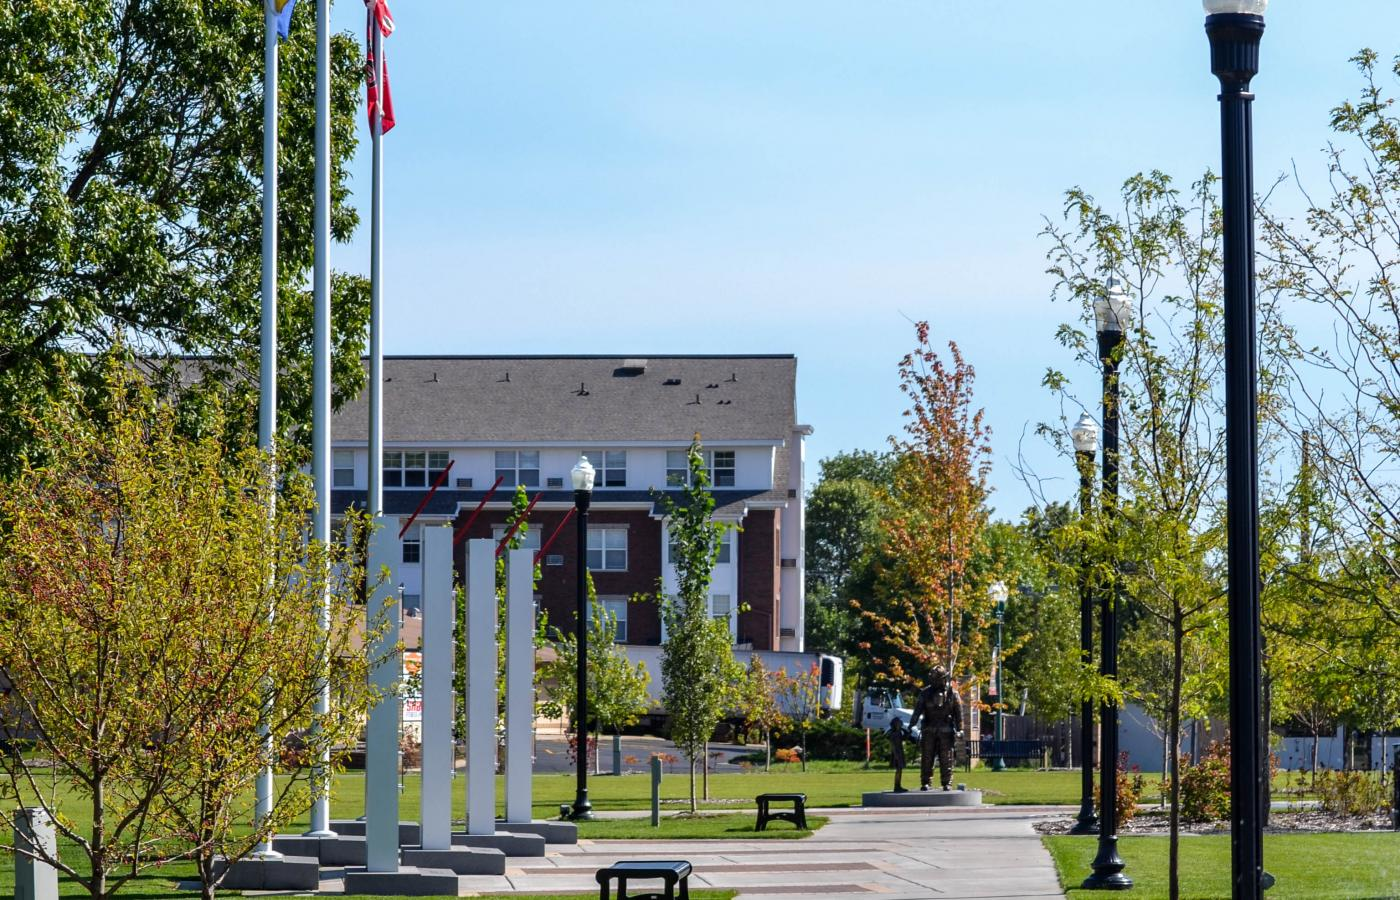 Chaska Curling Center - 7